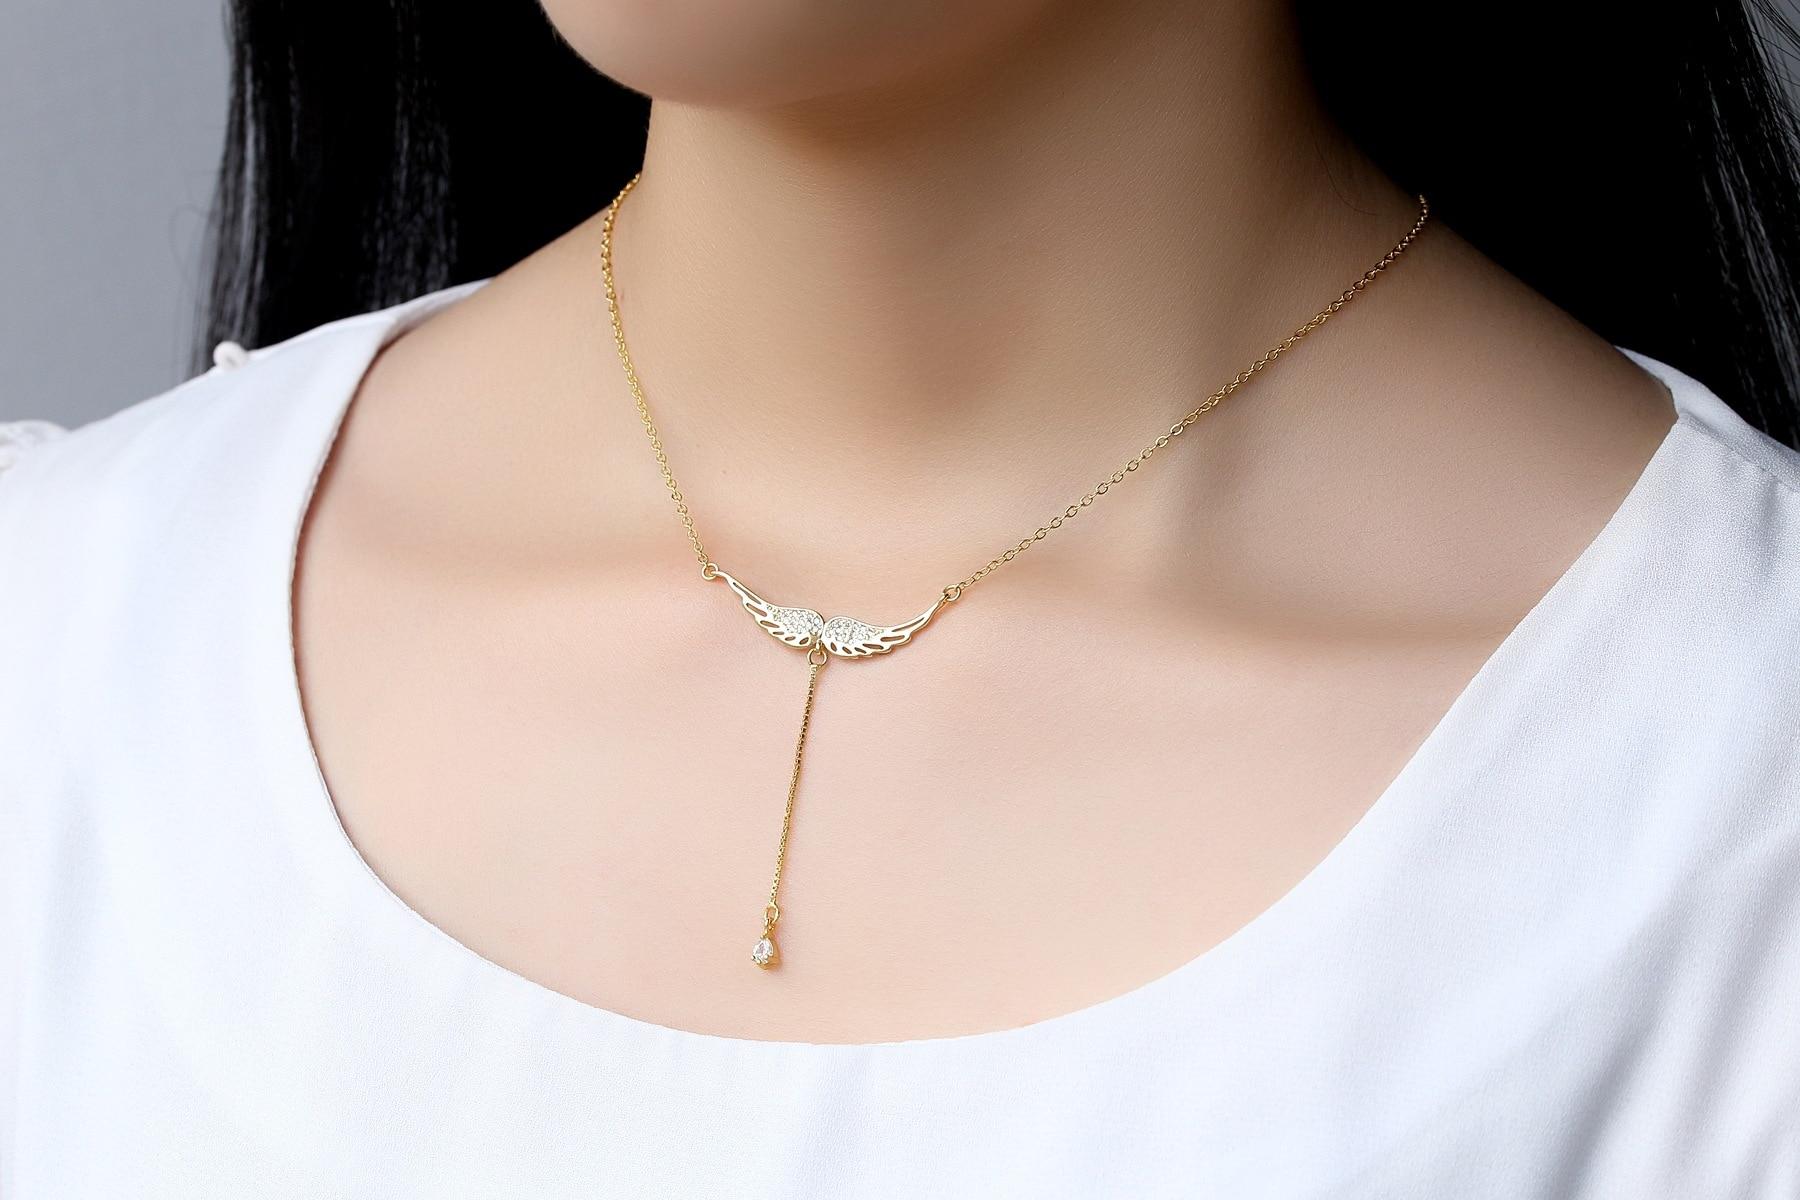 Beste Halsband Halsreif Aus Sterlingsilber Fotos - Elektrische ...